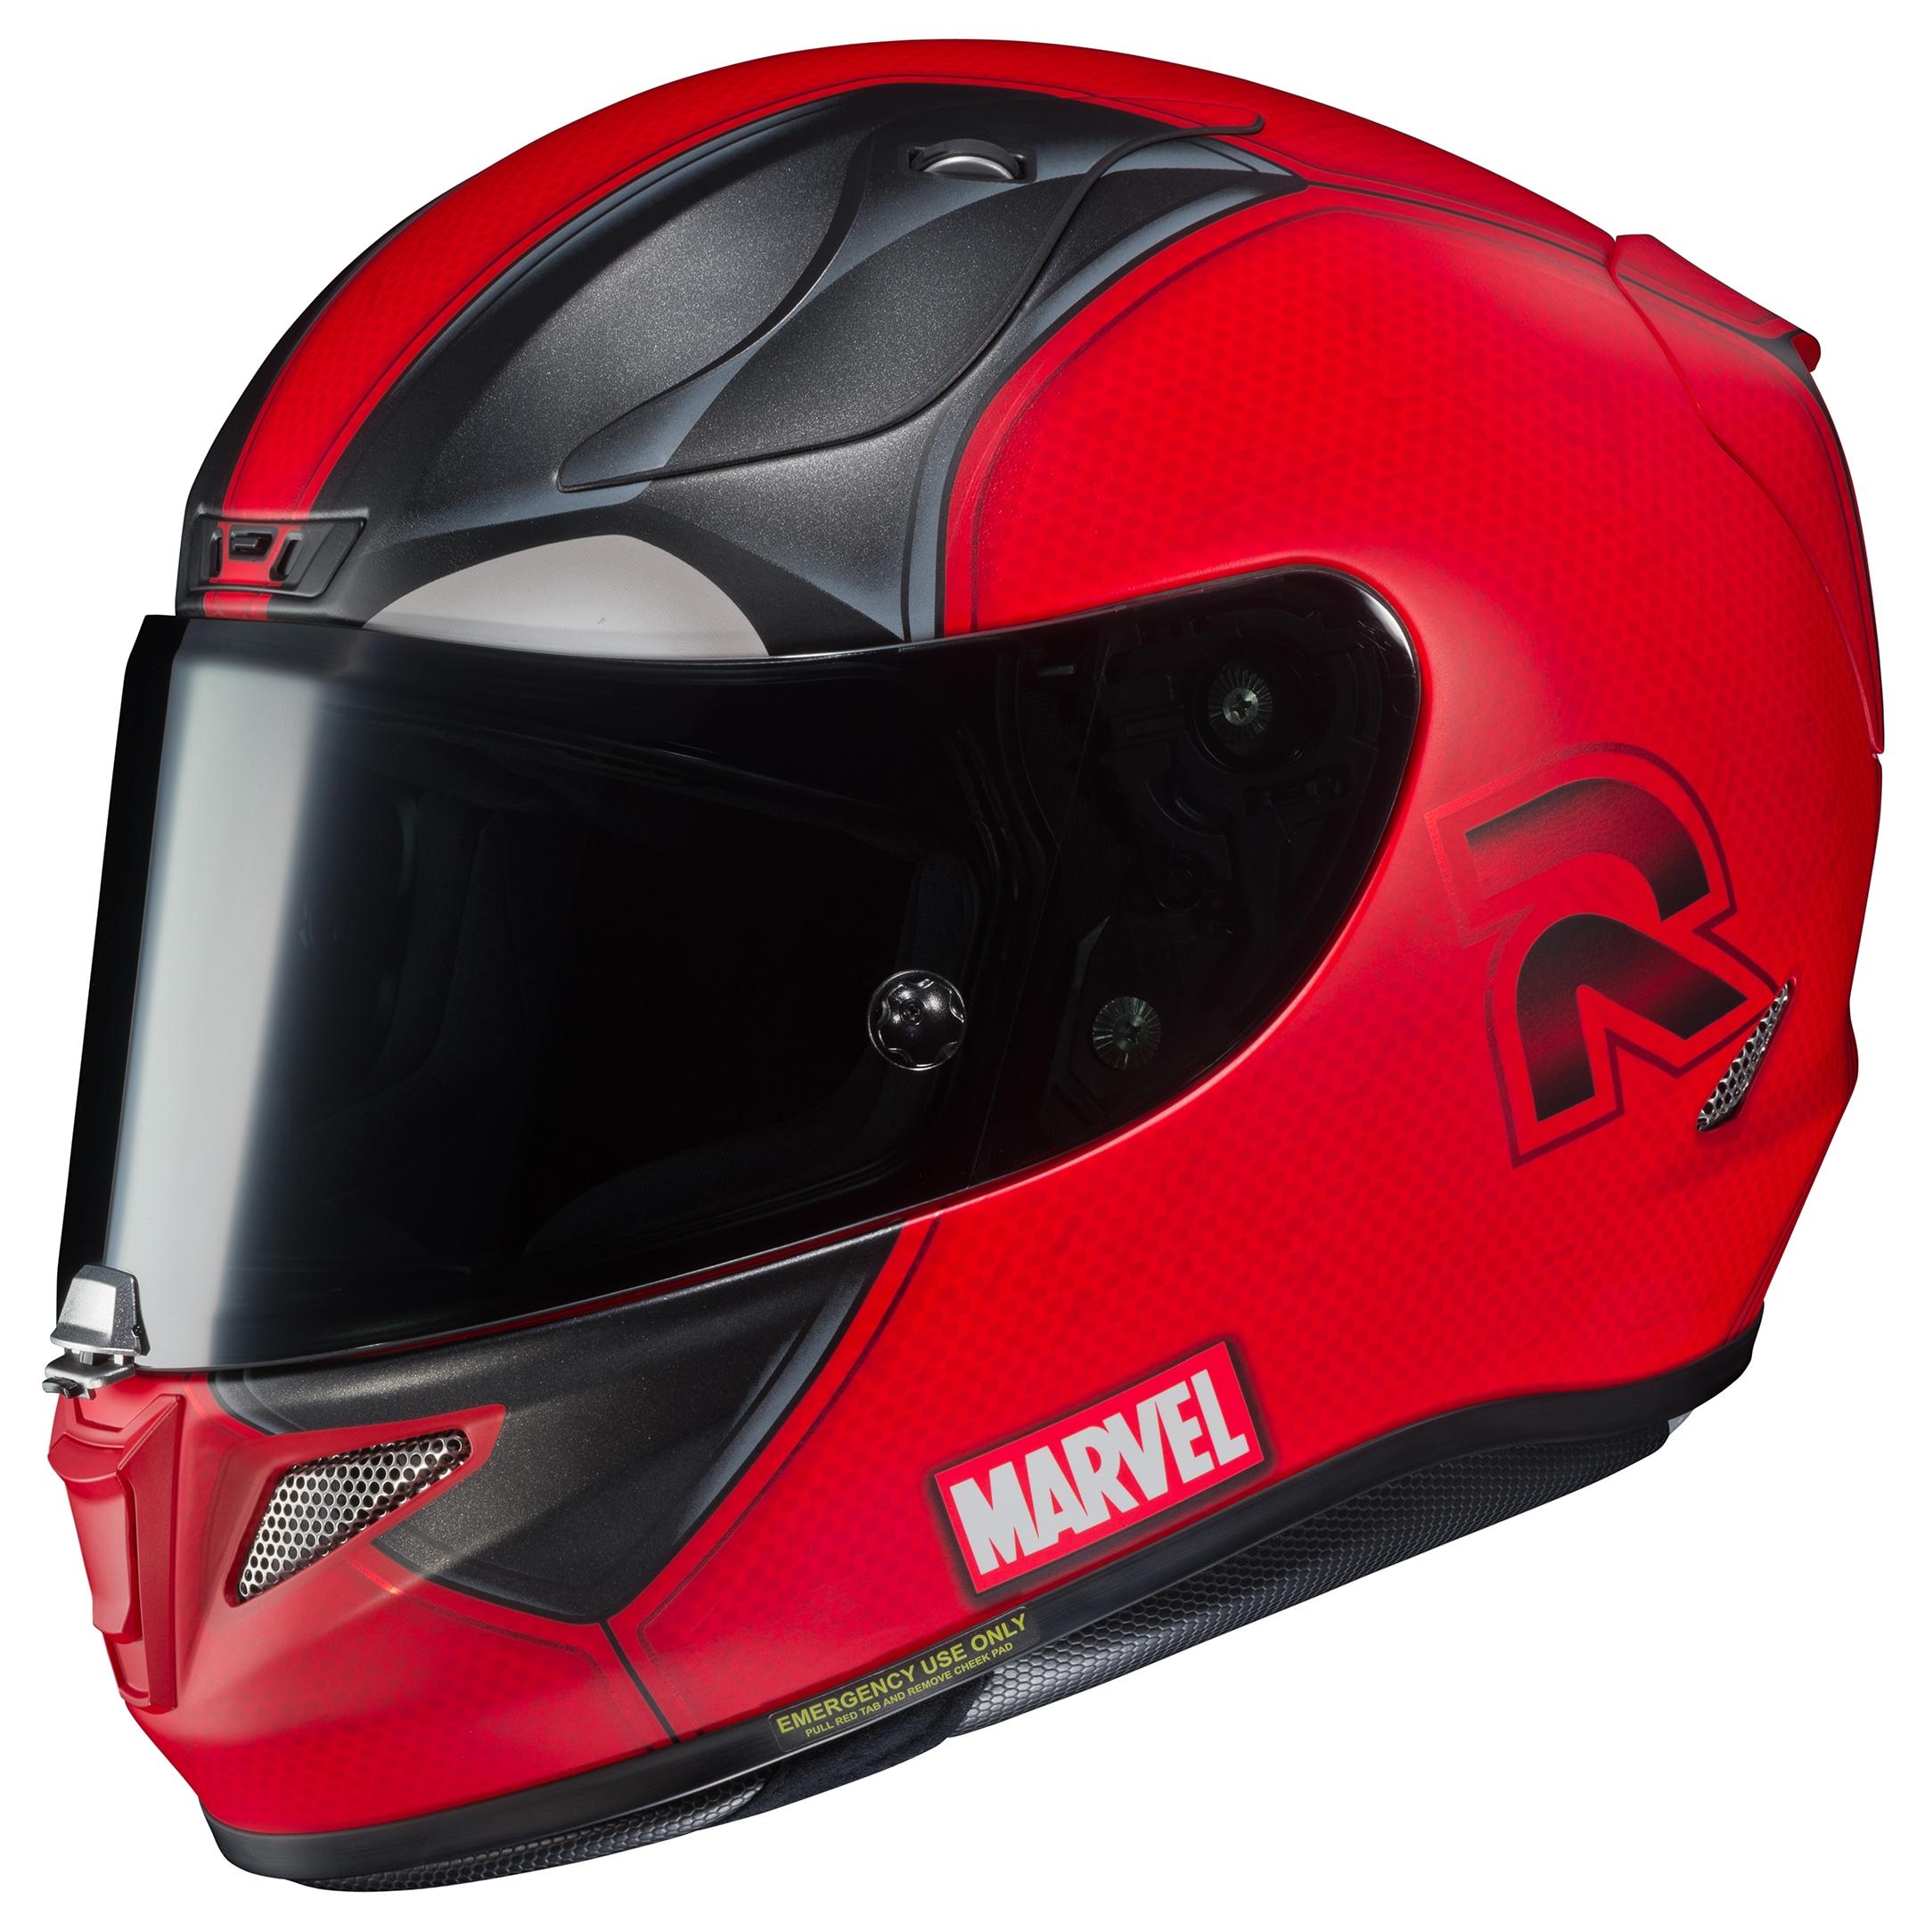 132e4d43 HJC RPHA 11 Pro Deadpool 2 Helmet | 10% ($60.00) Off! - RevZilla